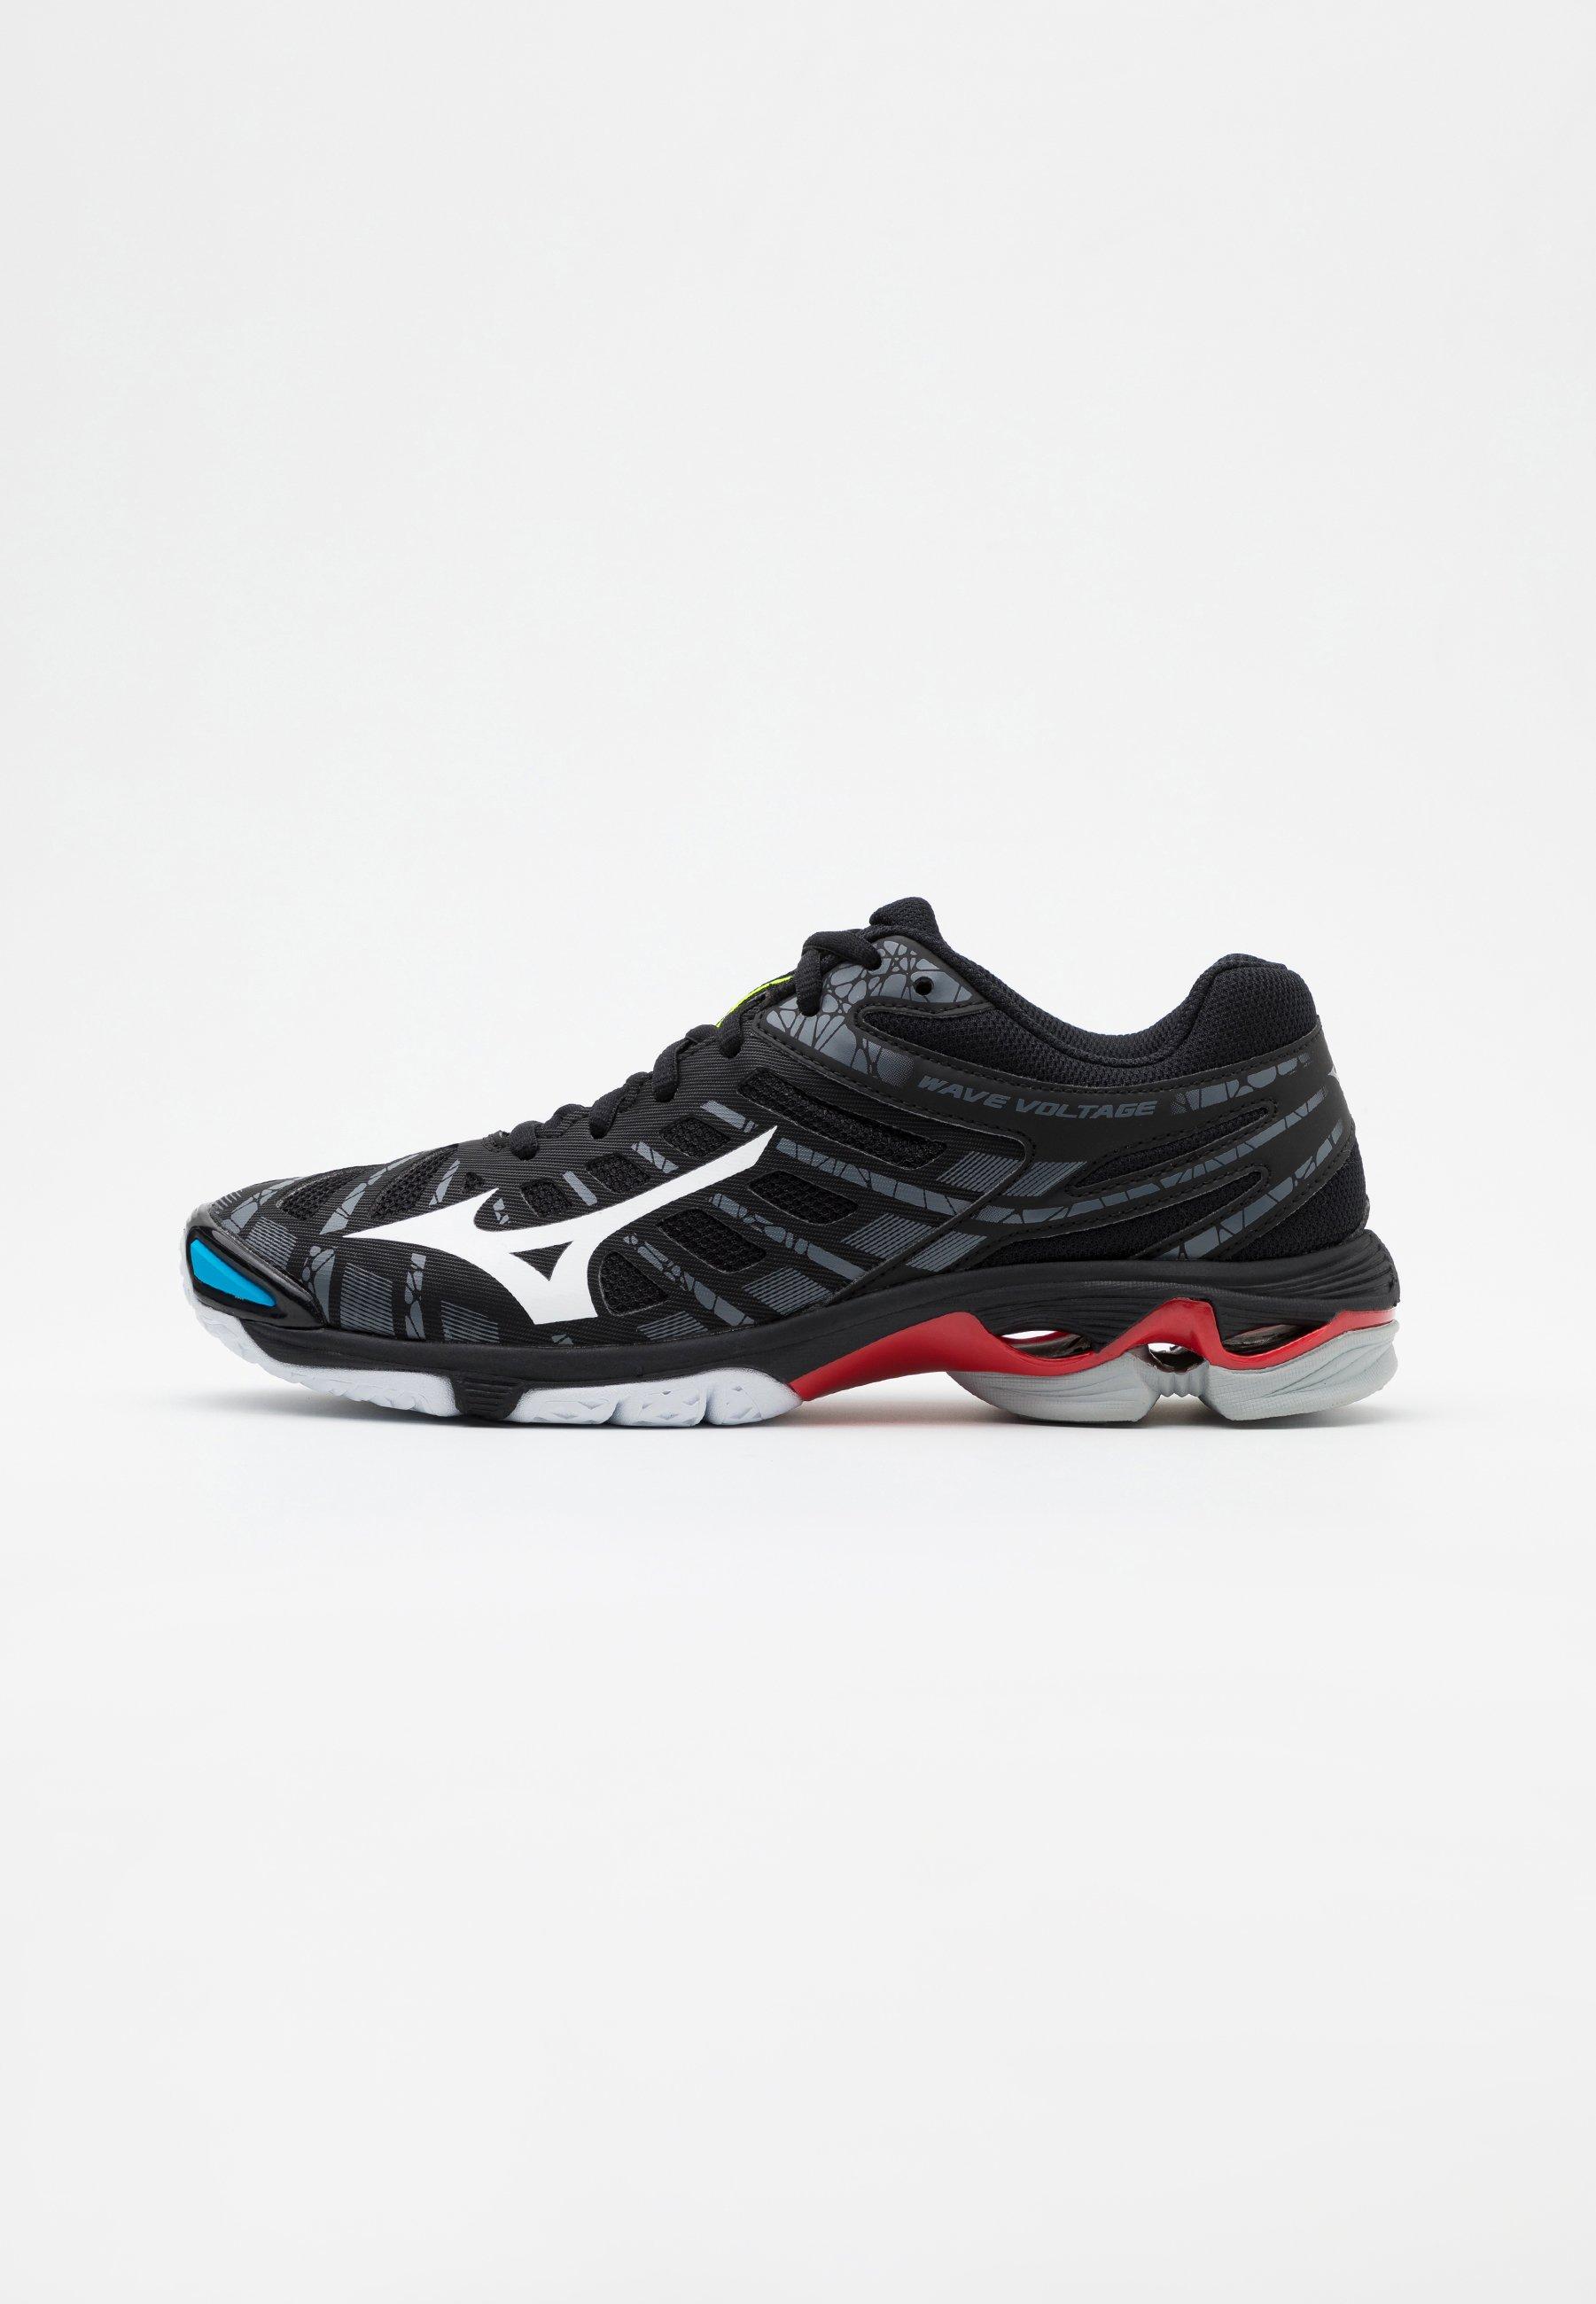 mizuno womens volleyball shoes size 8 x 1 jacket uk